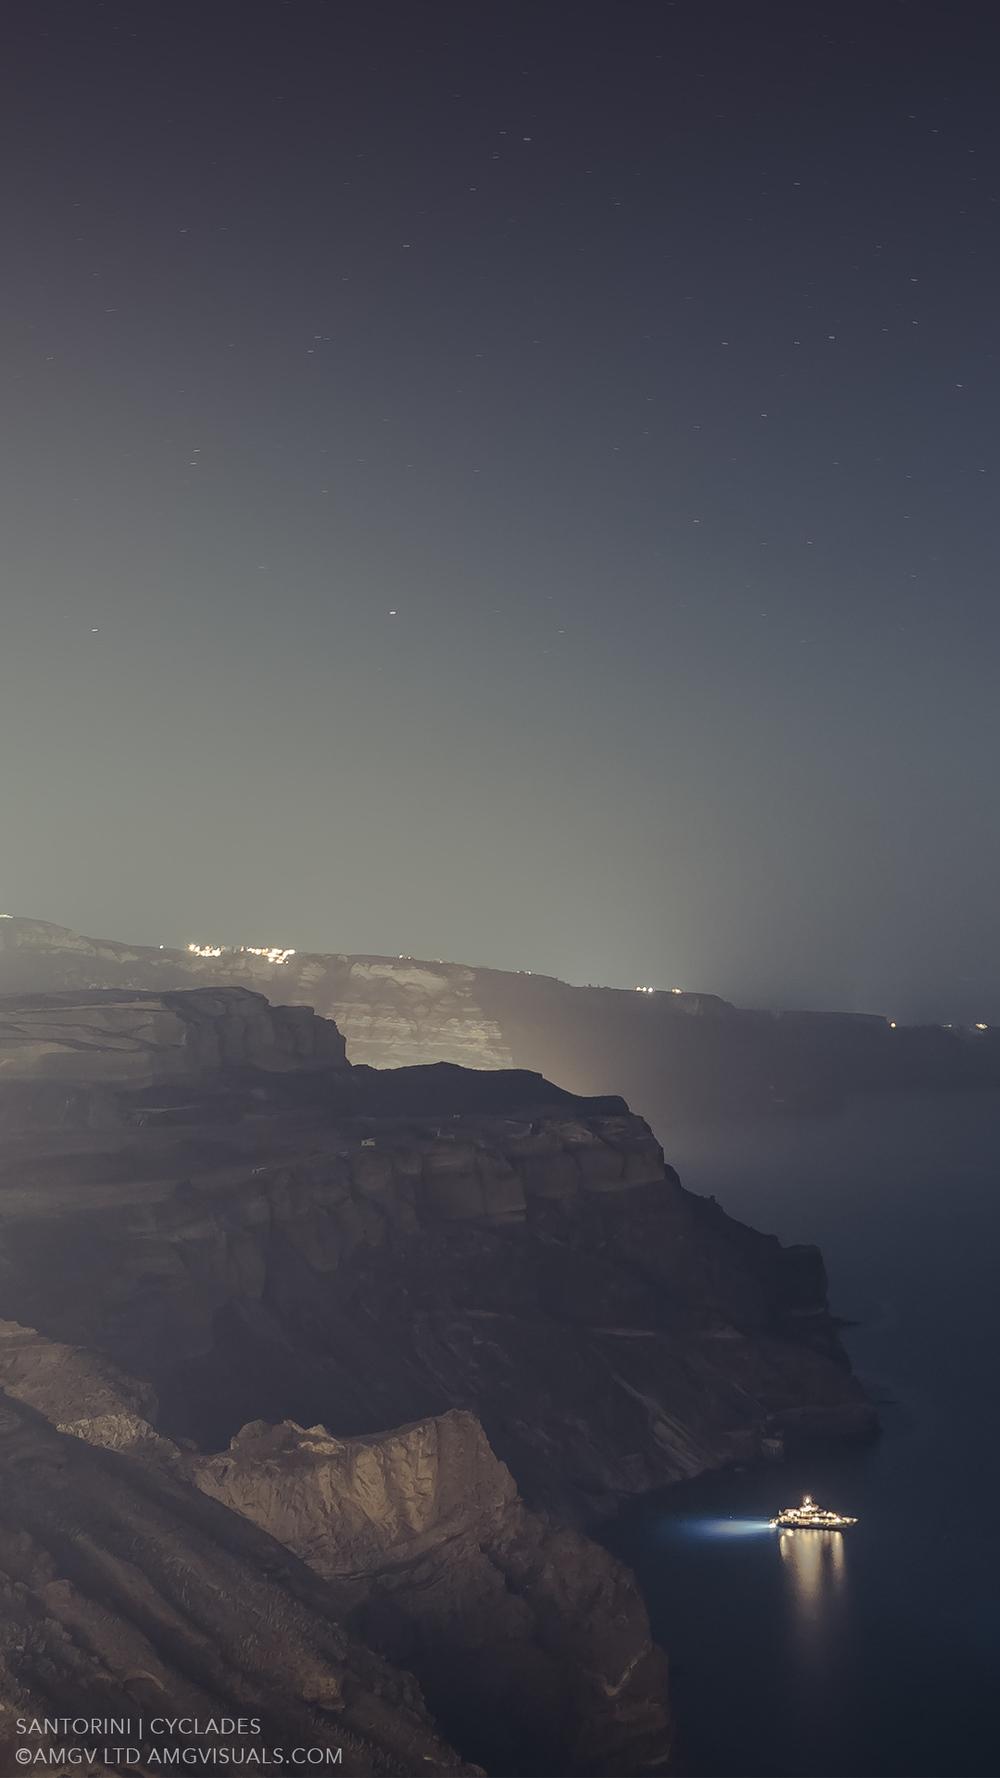 ©AMGV-LTD-Santorini+Cyclades-3.jpg